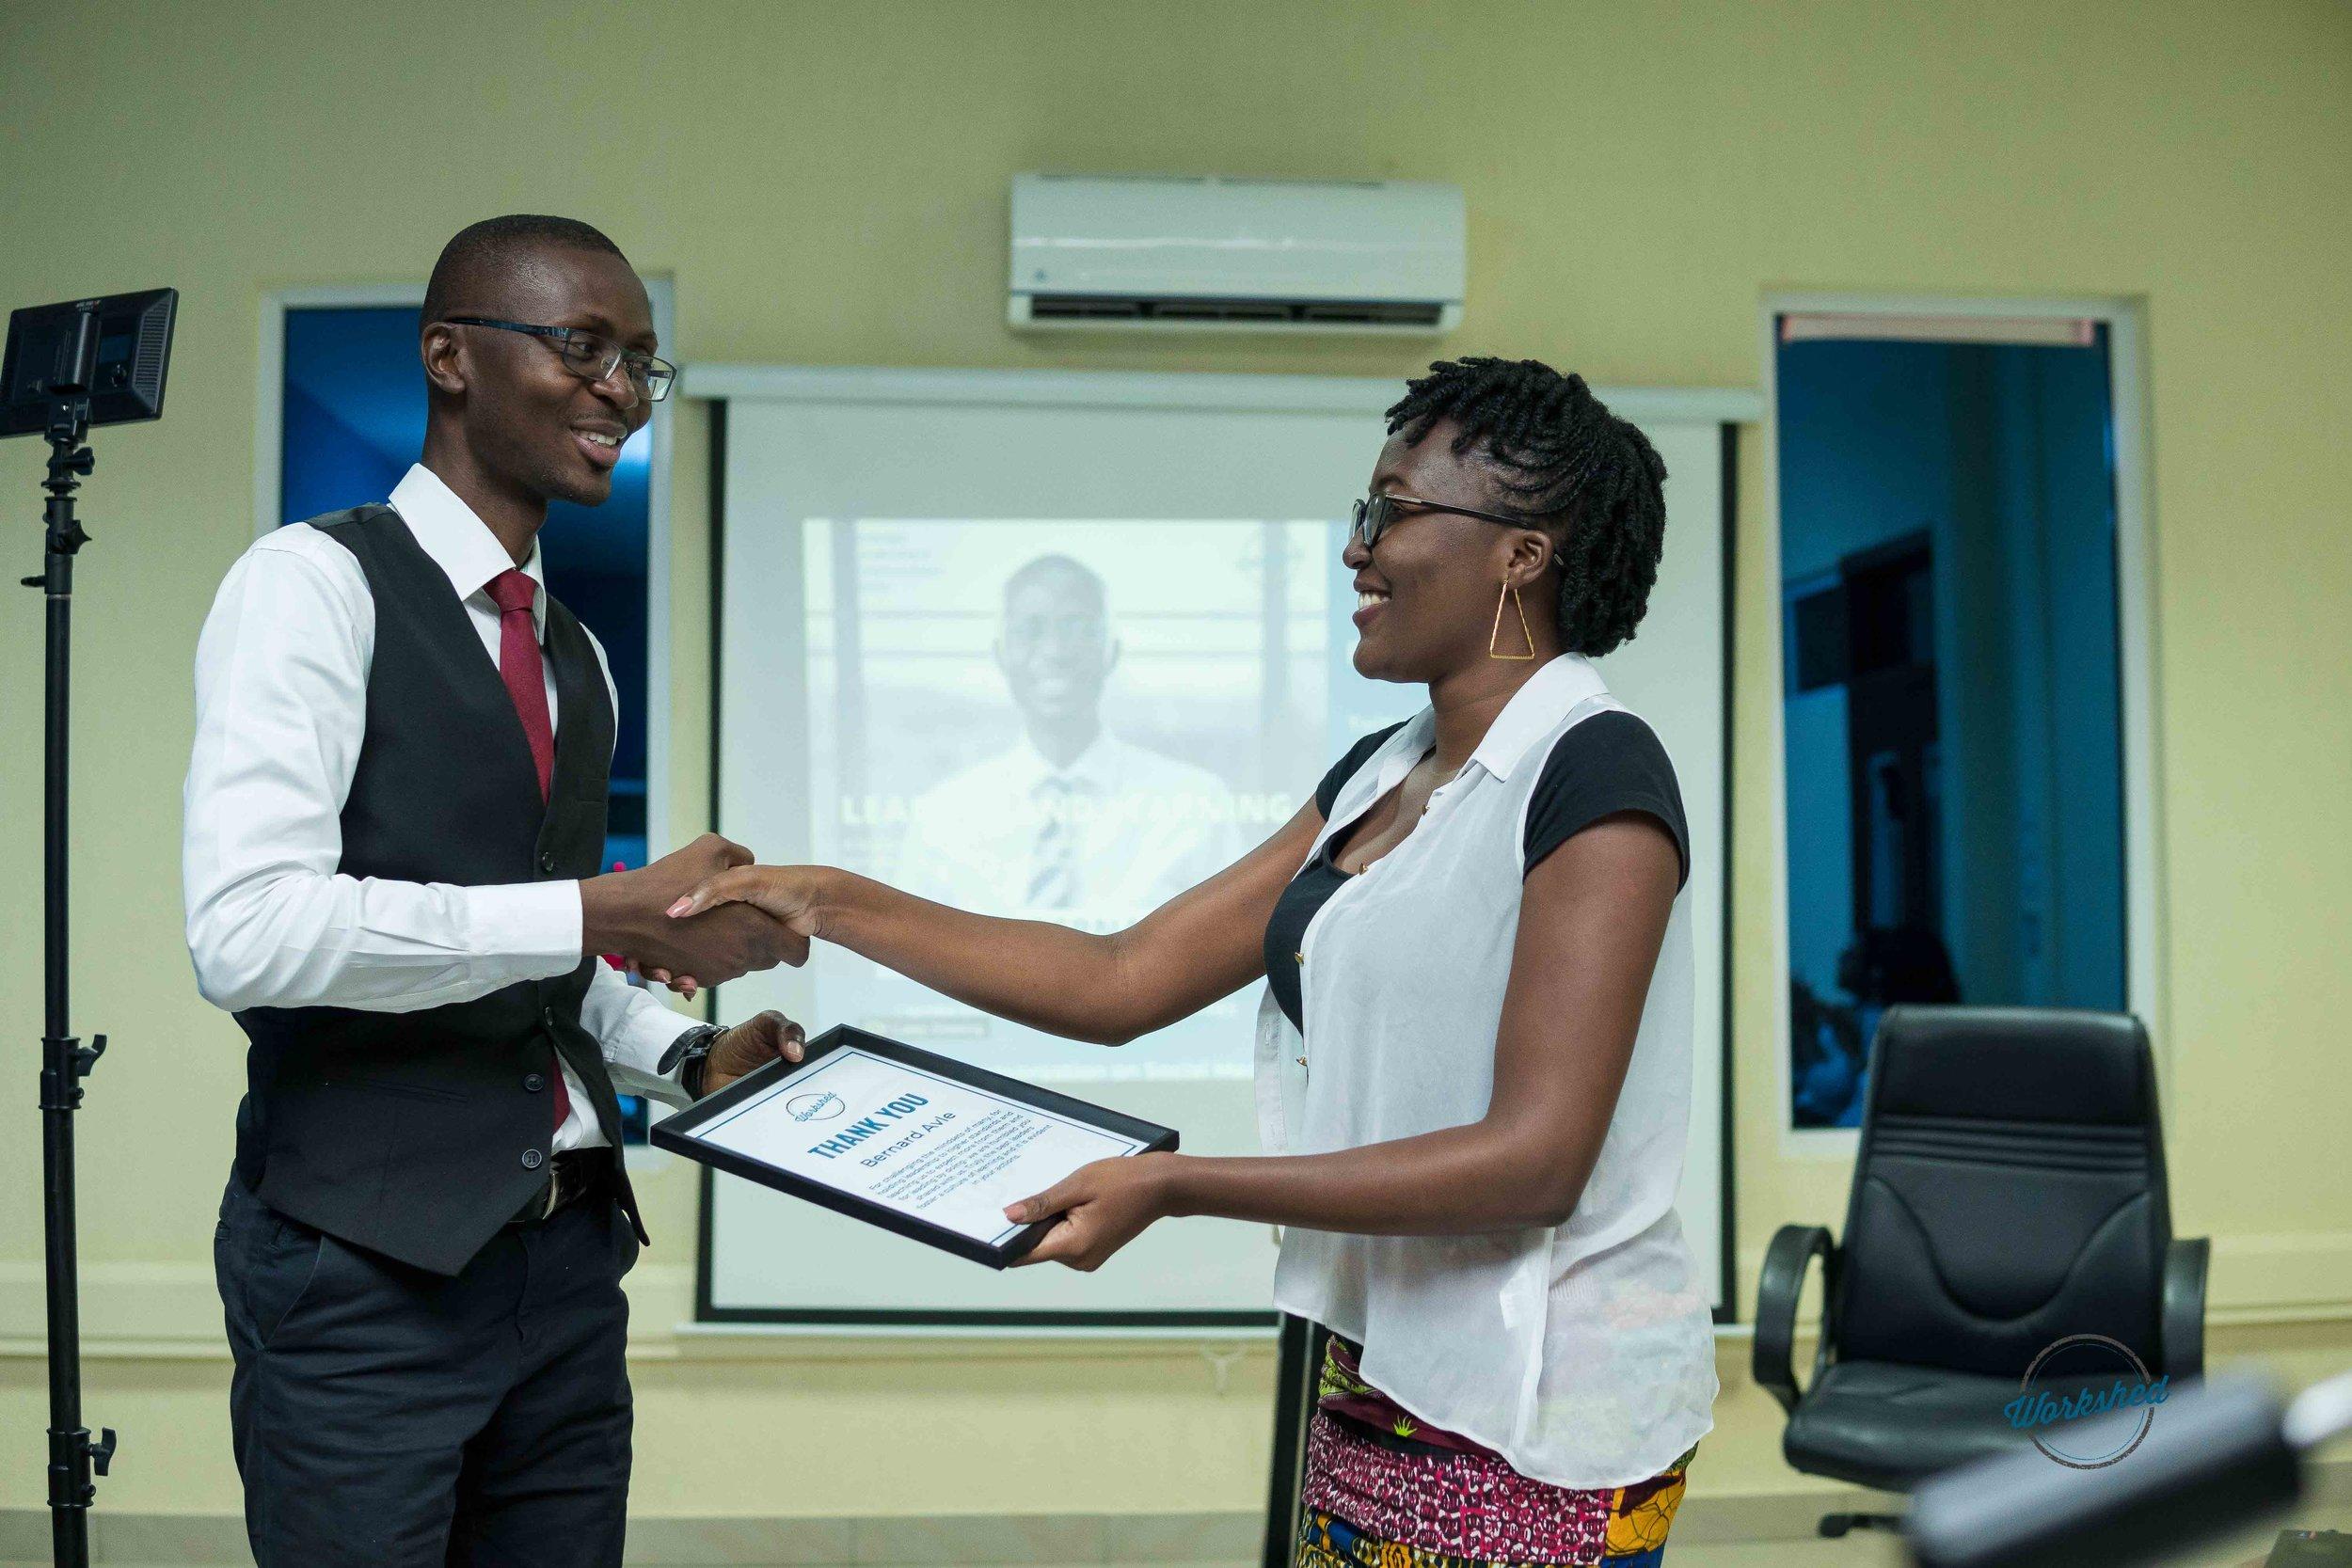 SLES with Bernard Koku Avle